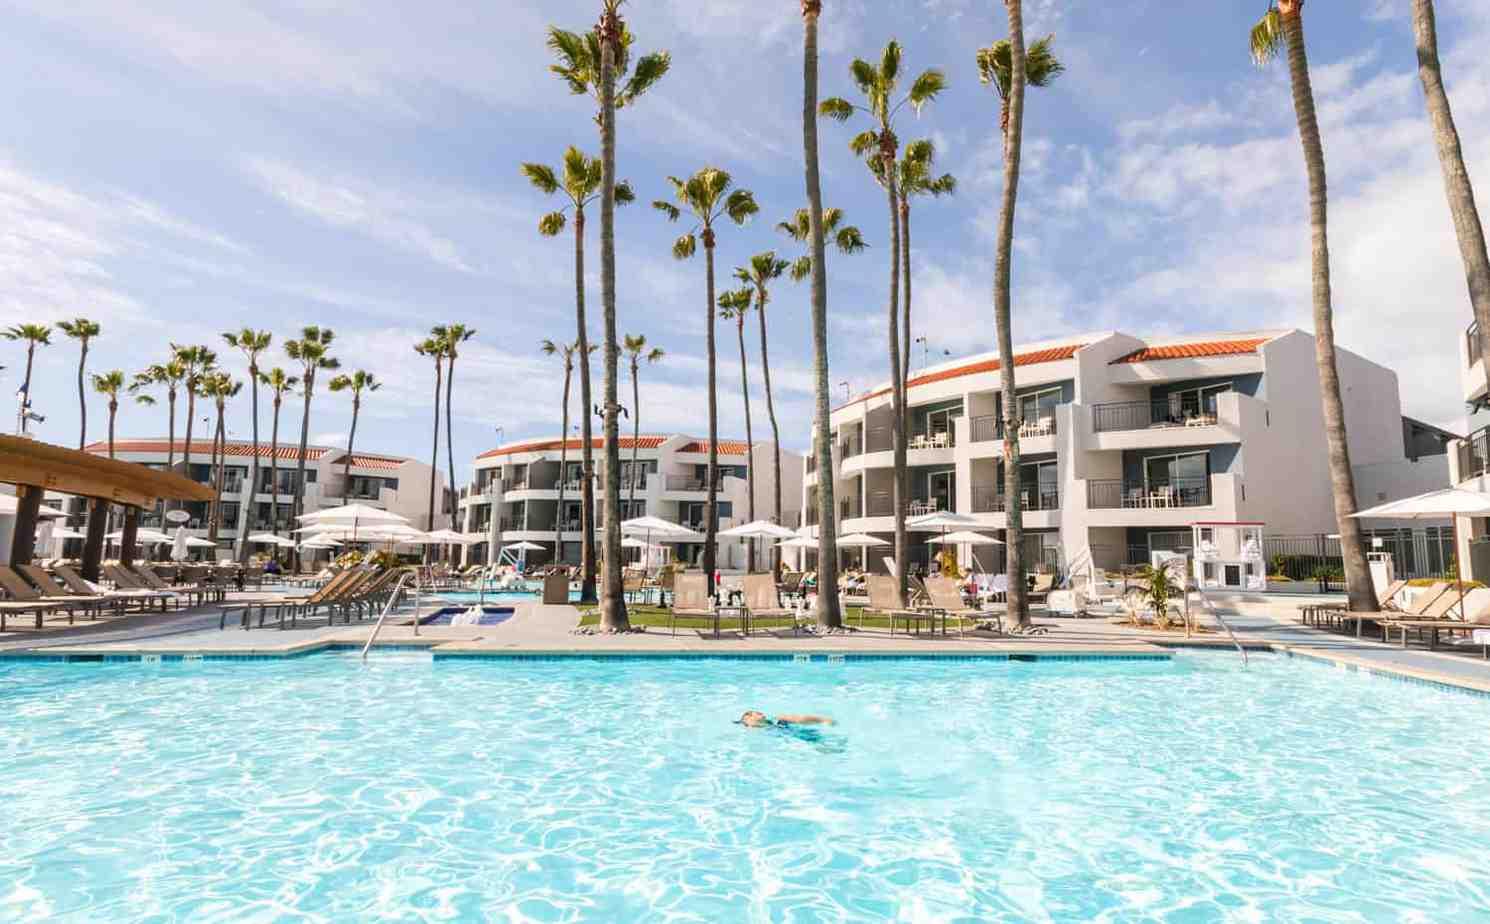 Loews Coronado Swimming Pool